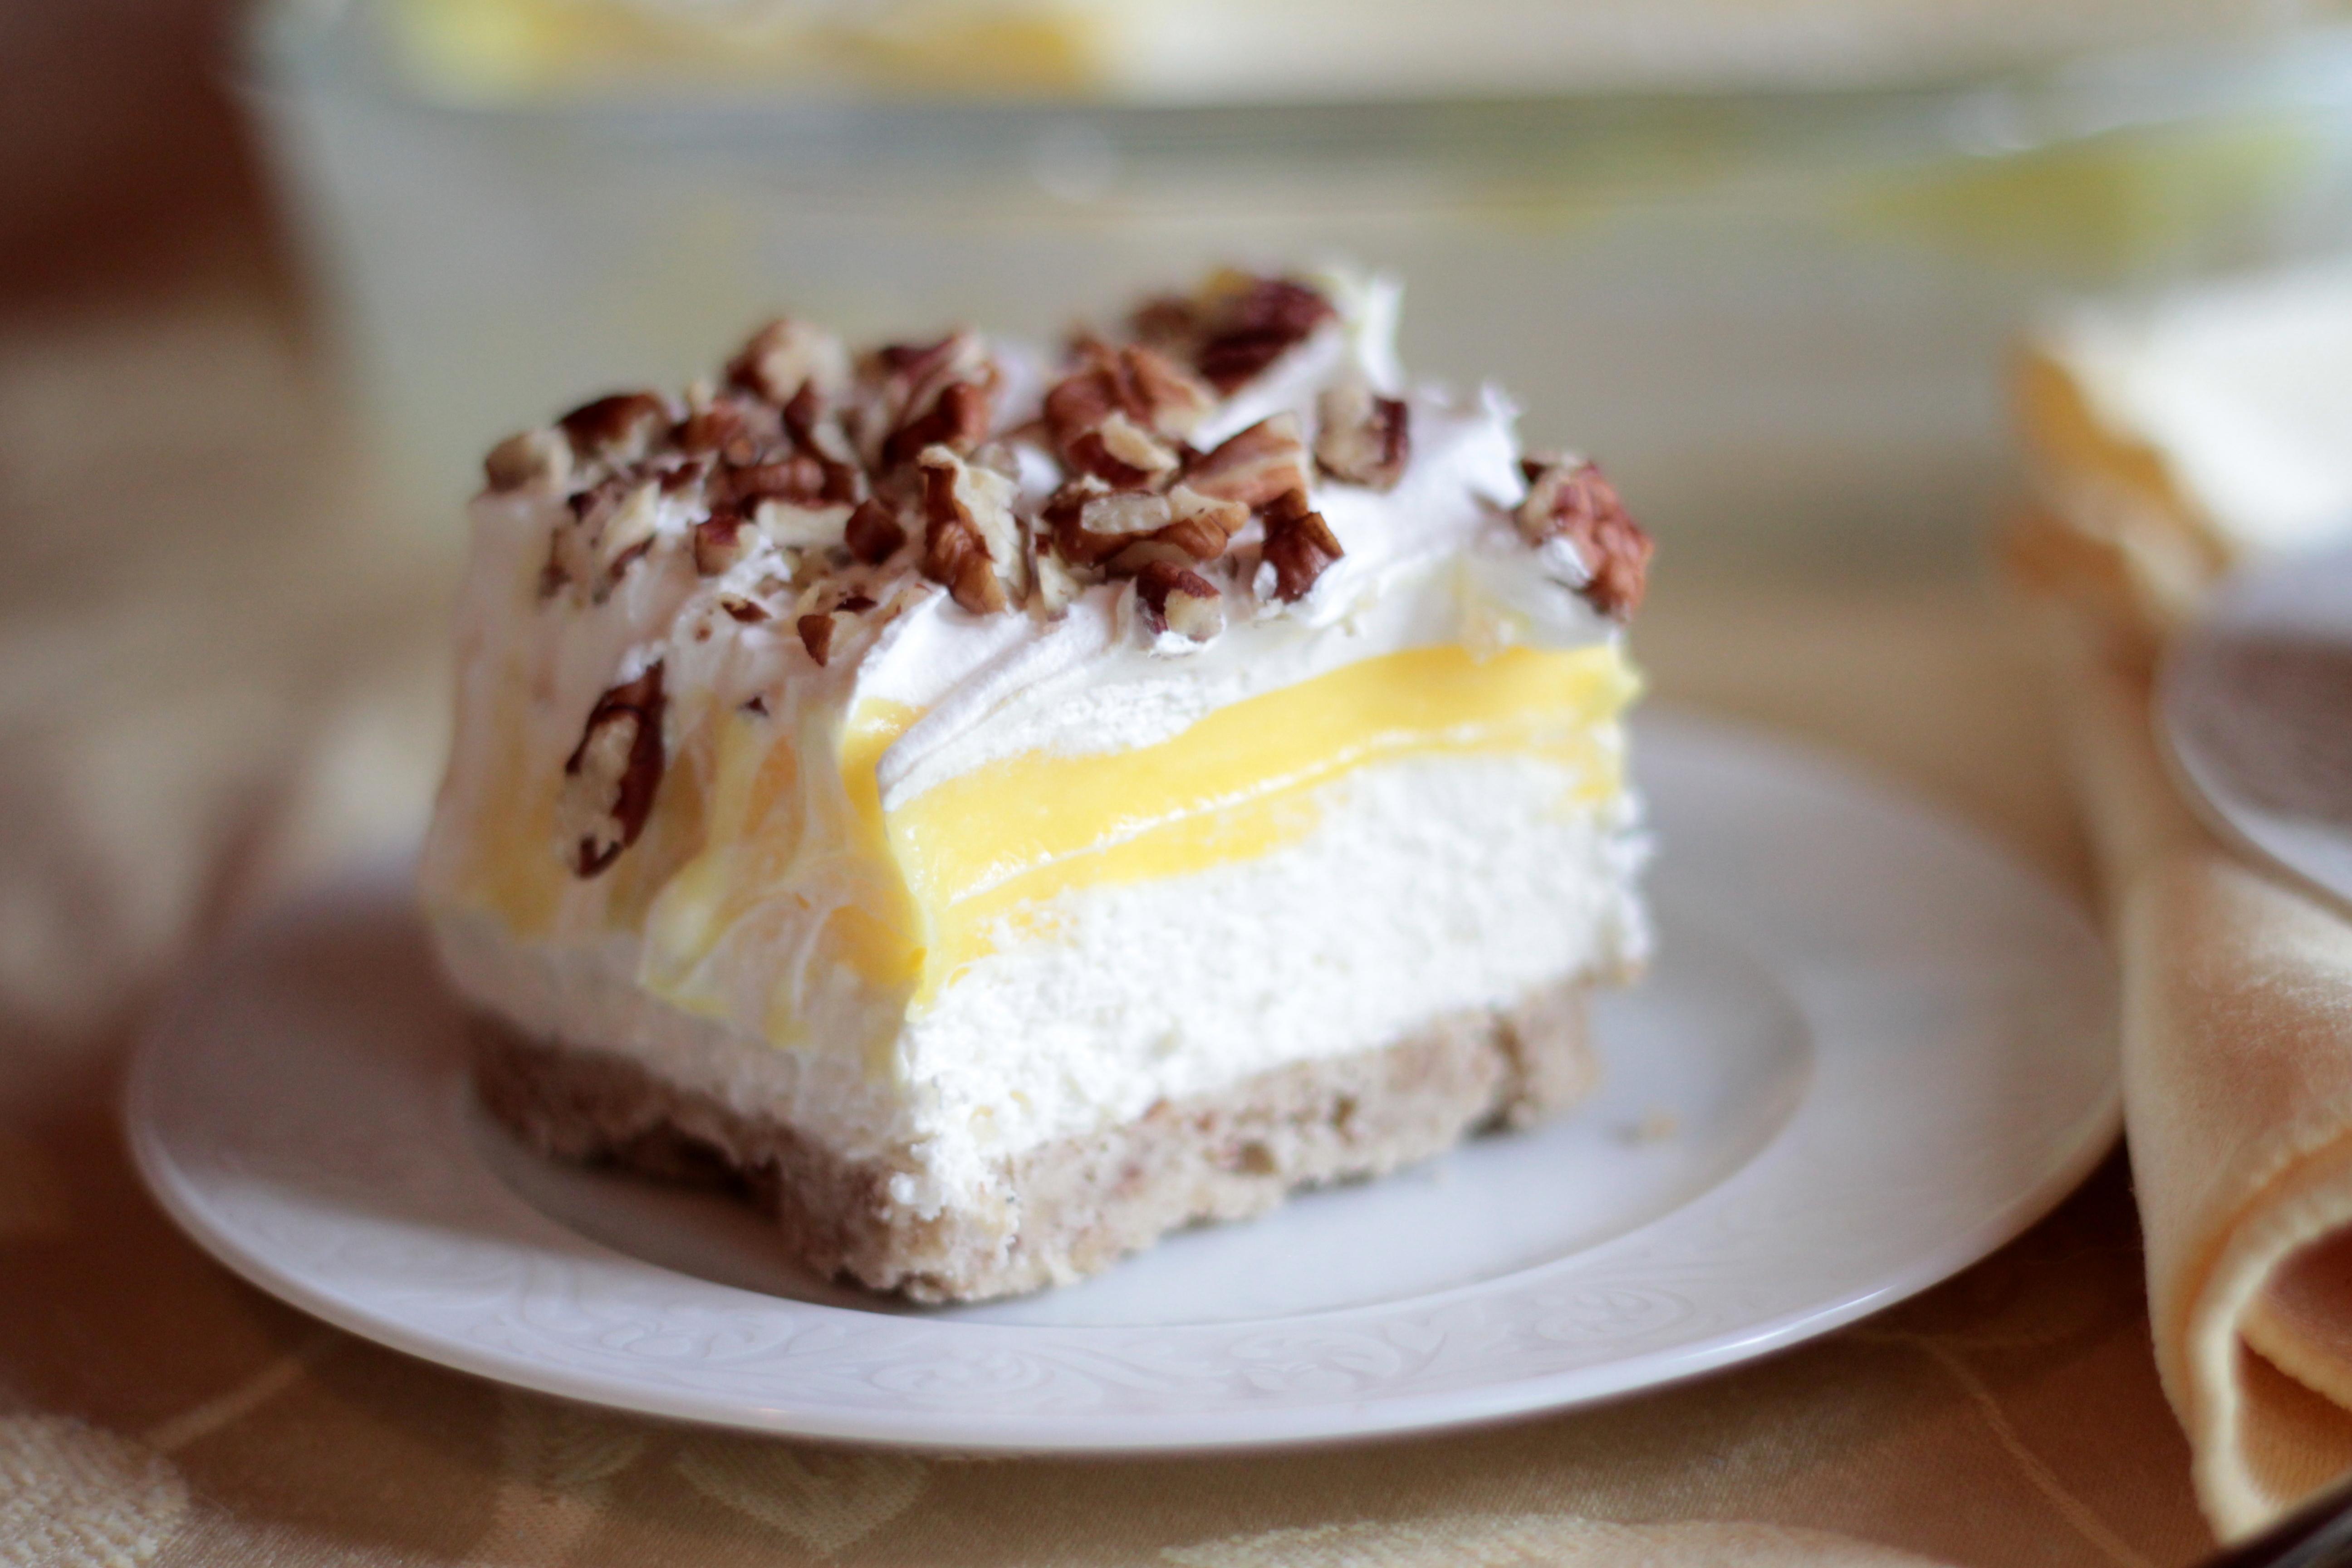 Best Cake Recipes Lemon: Luscious Lemon Dessert